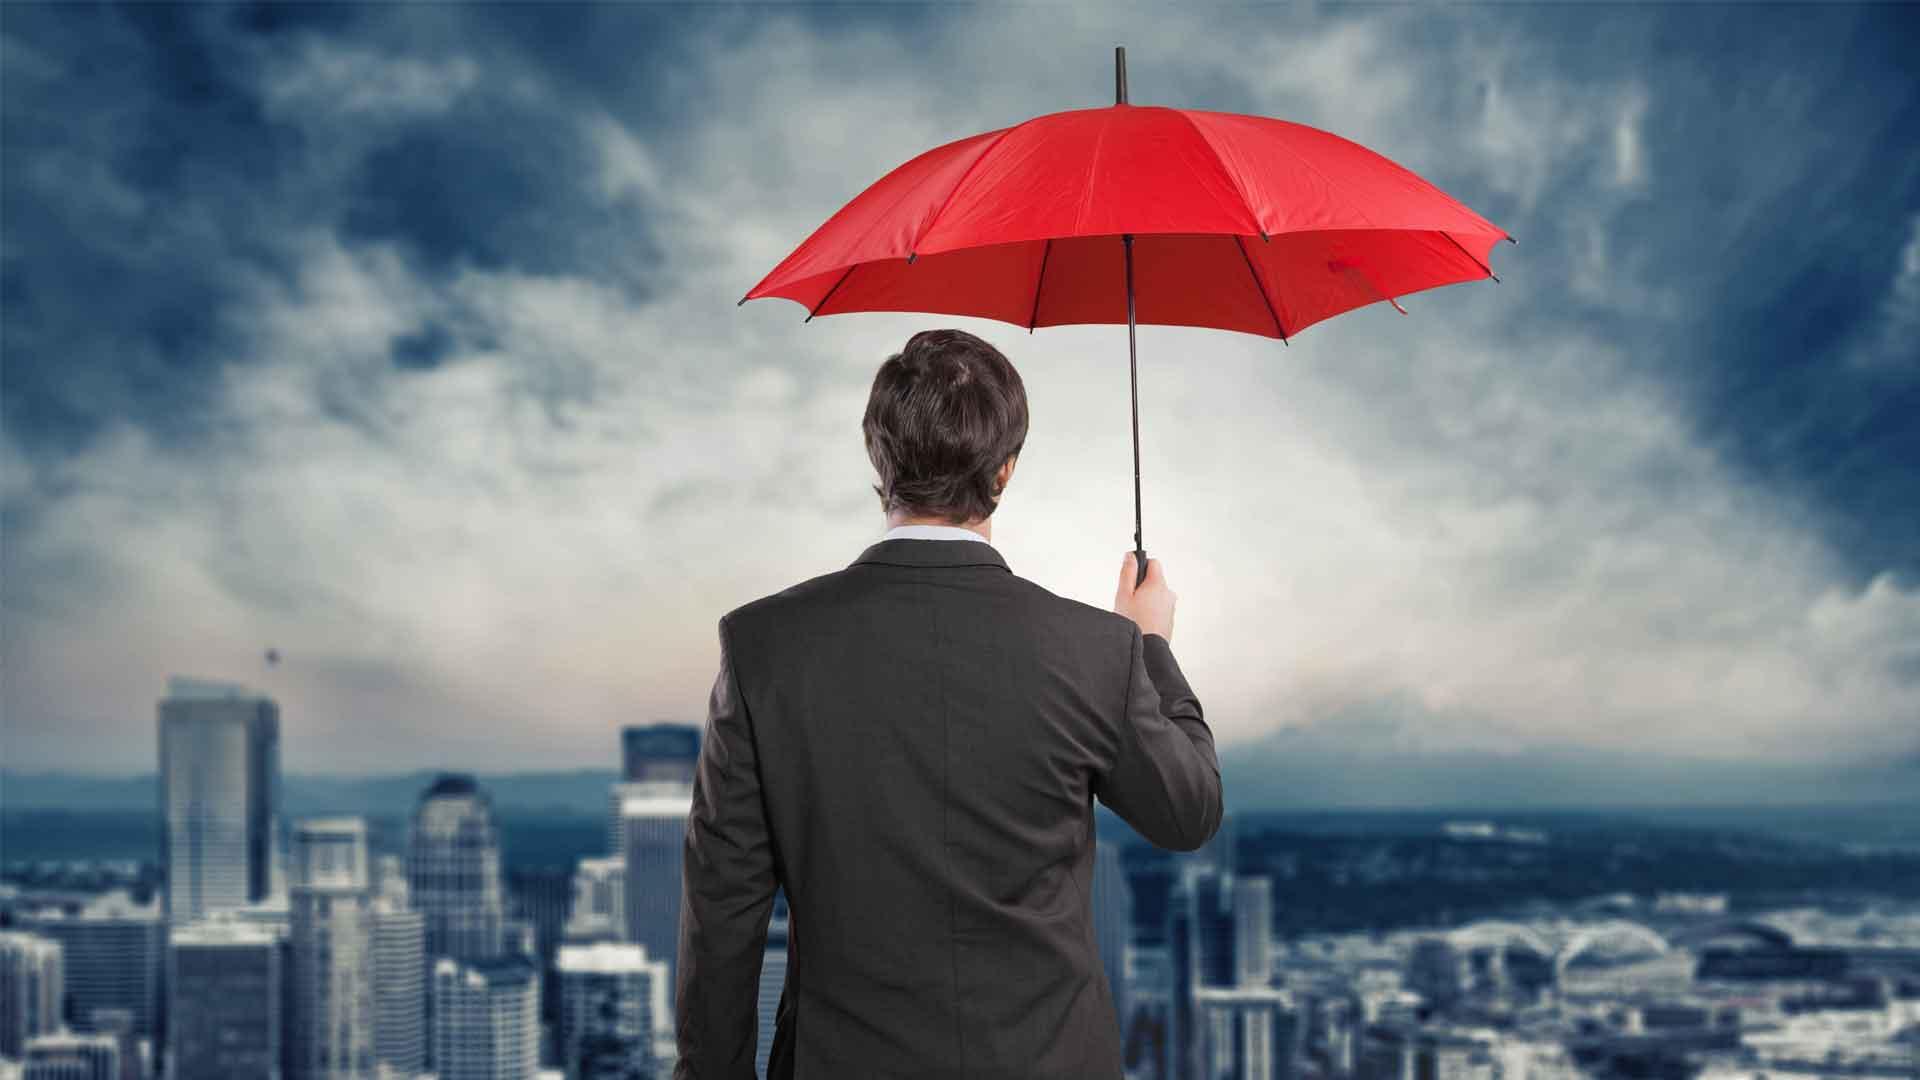 Man standing with umbrella representing umbrella insurance